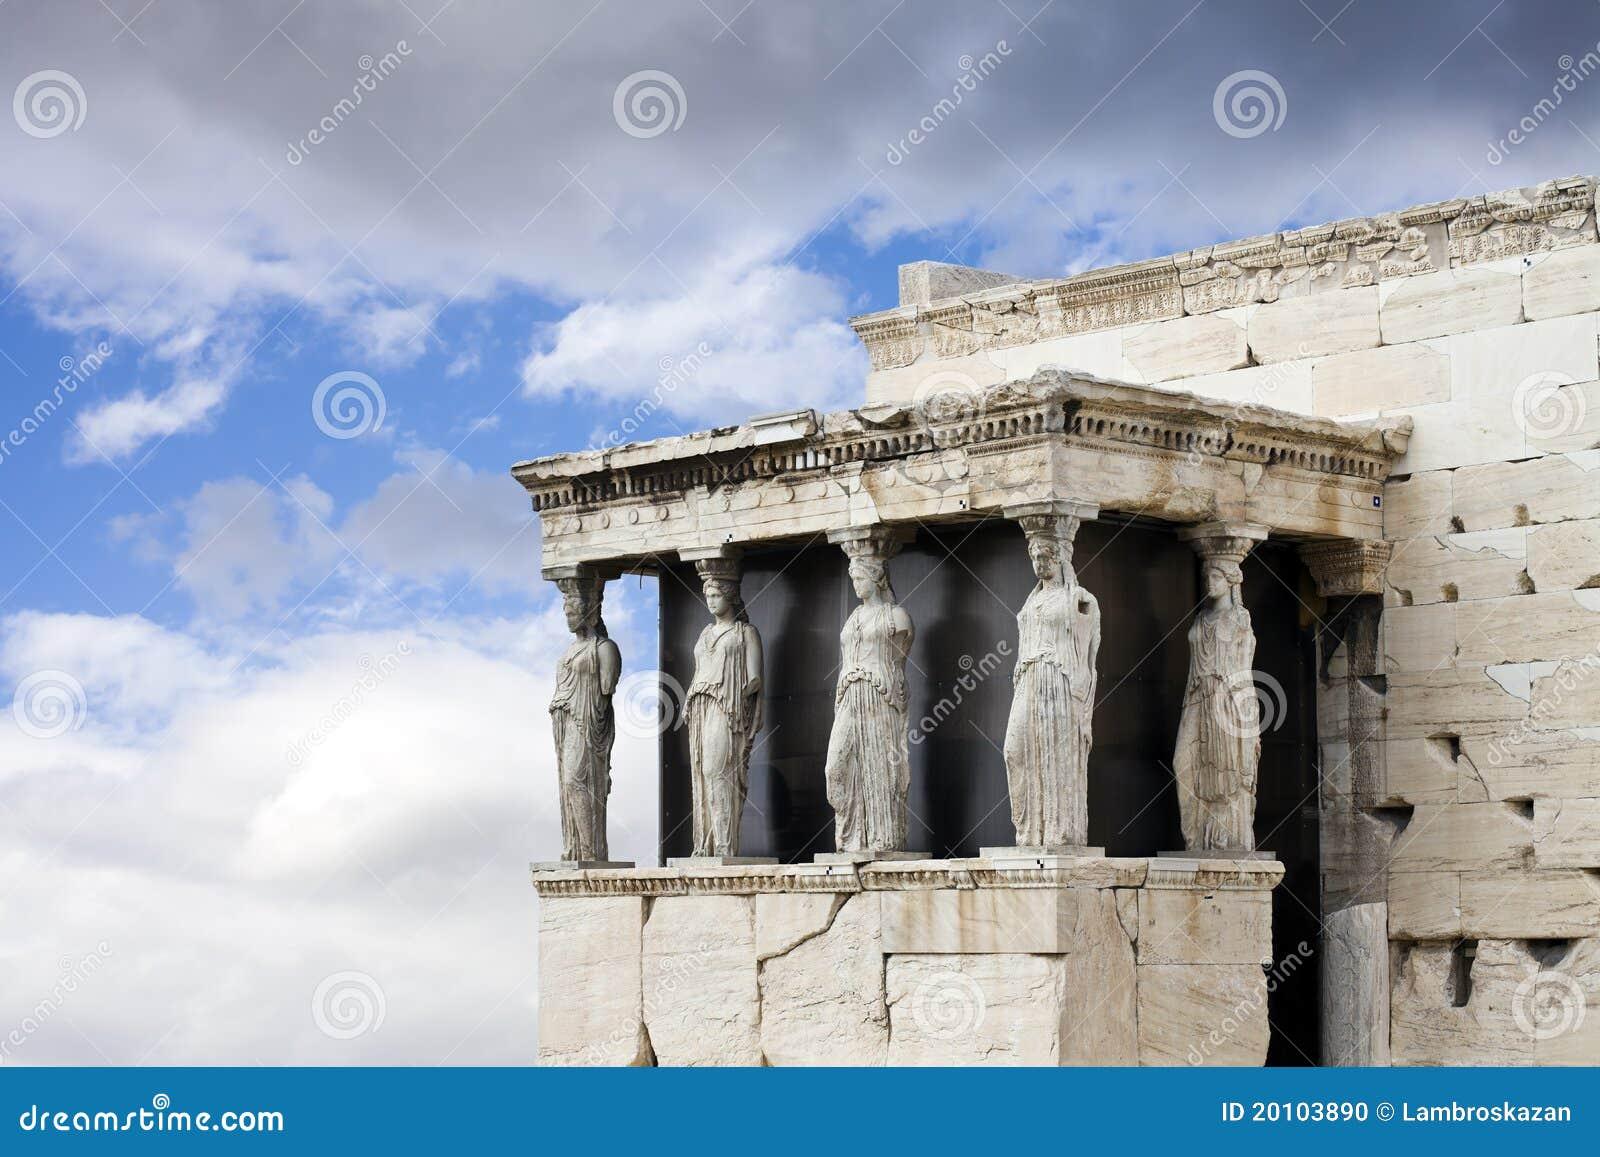 Caryatids, Temple of Erechtheum, Acropolis, Athens